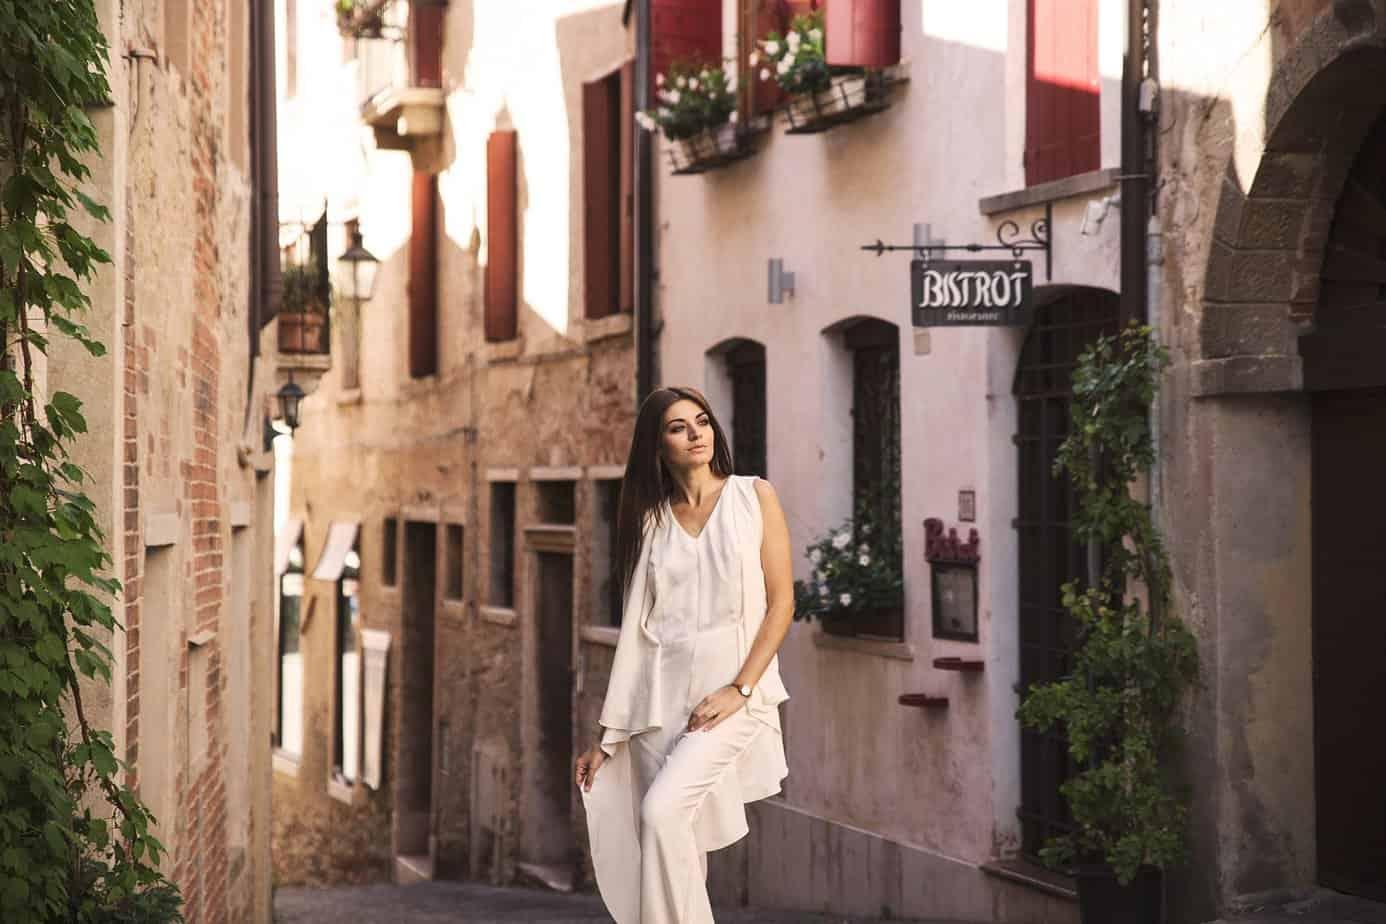 Flora_Asolo_florasrunway_floradallevacche_portrait_francescabandiera